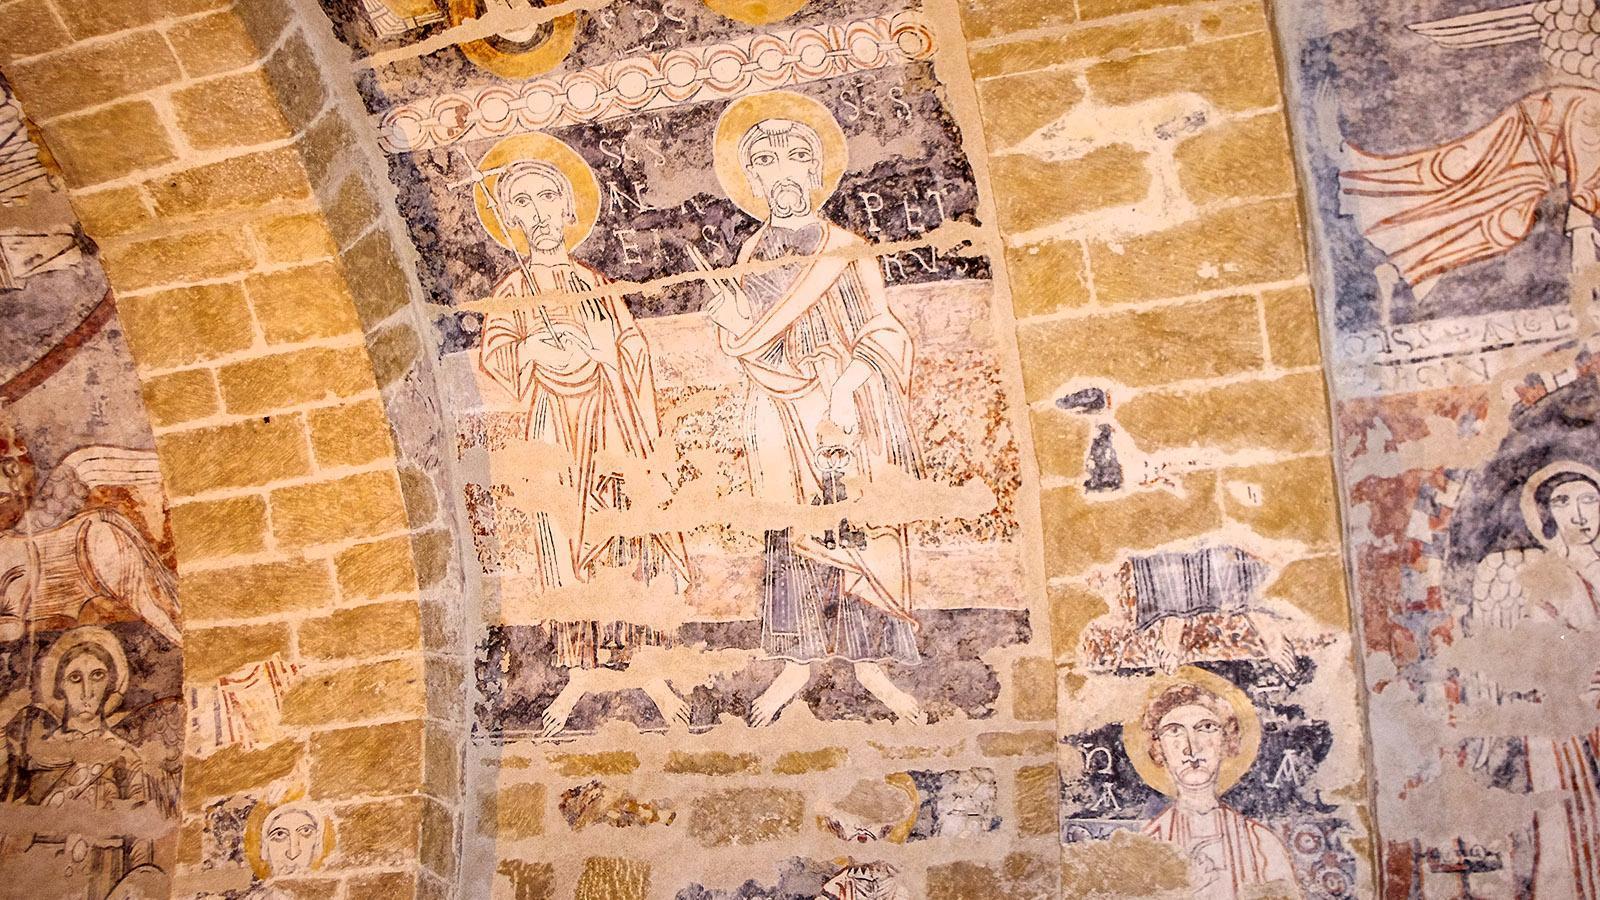 Die Fresken der Felsenkirche von Vals. Copyright:Agence Départementale du Tourisme Ariège-Pyrénées